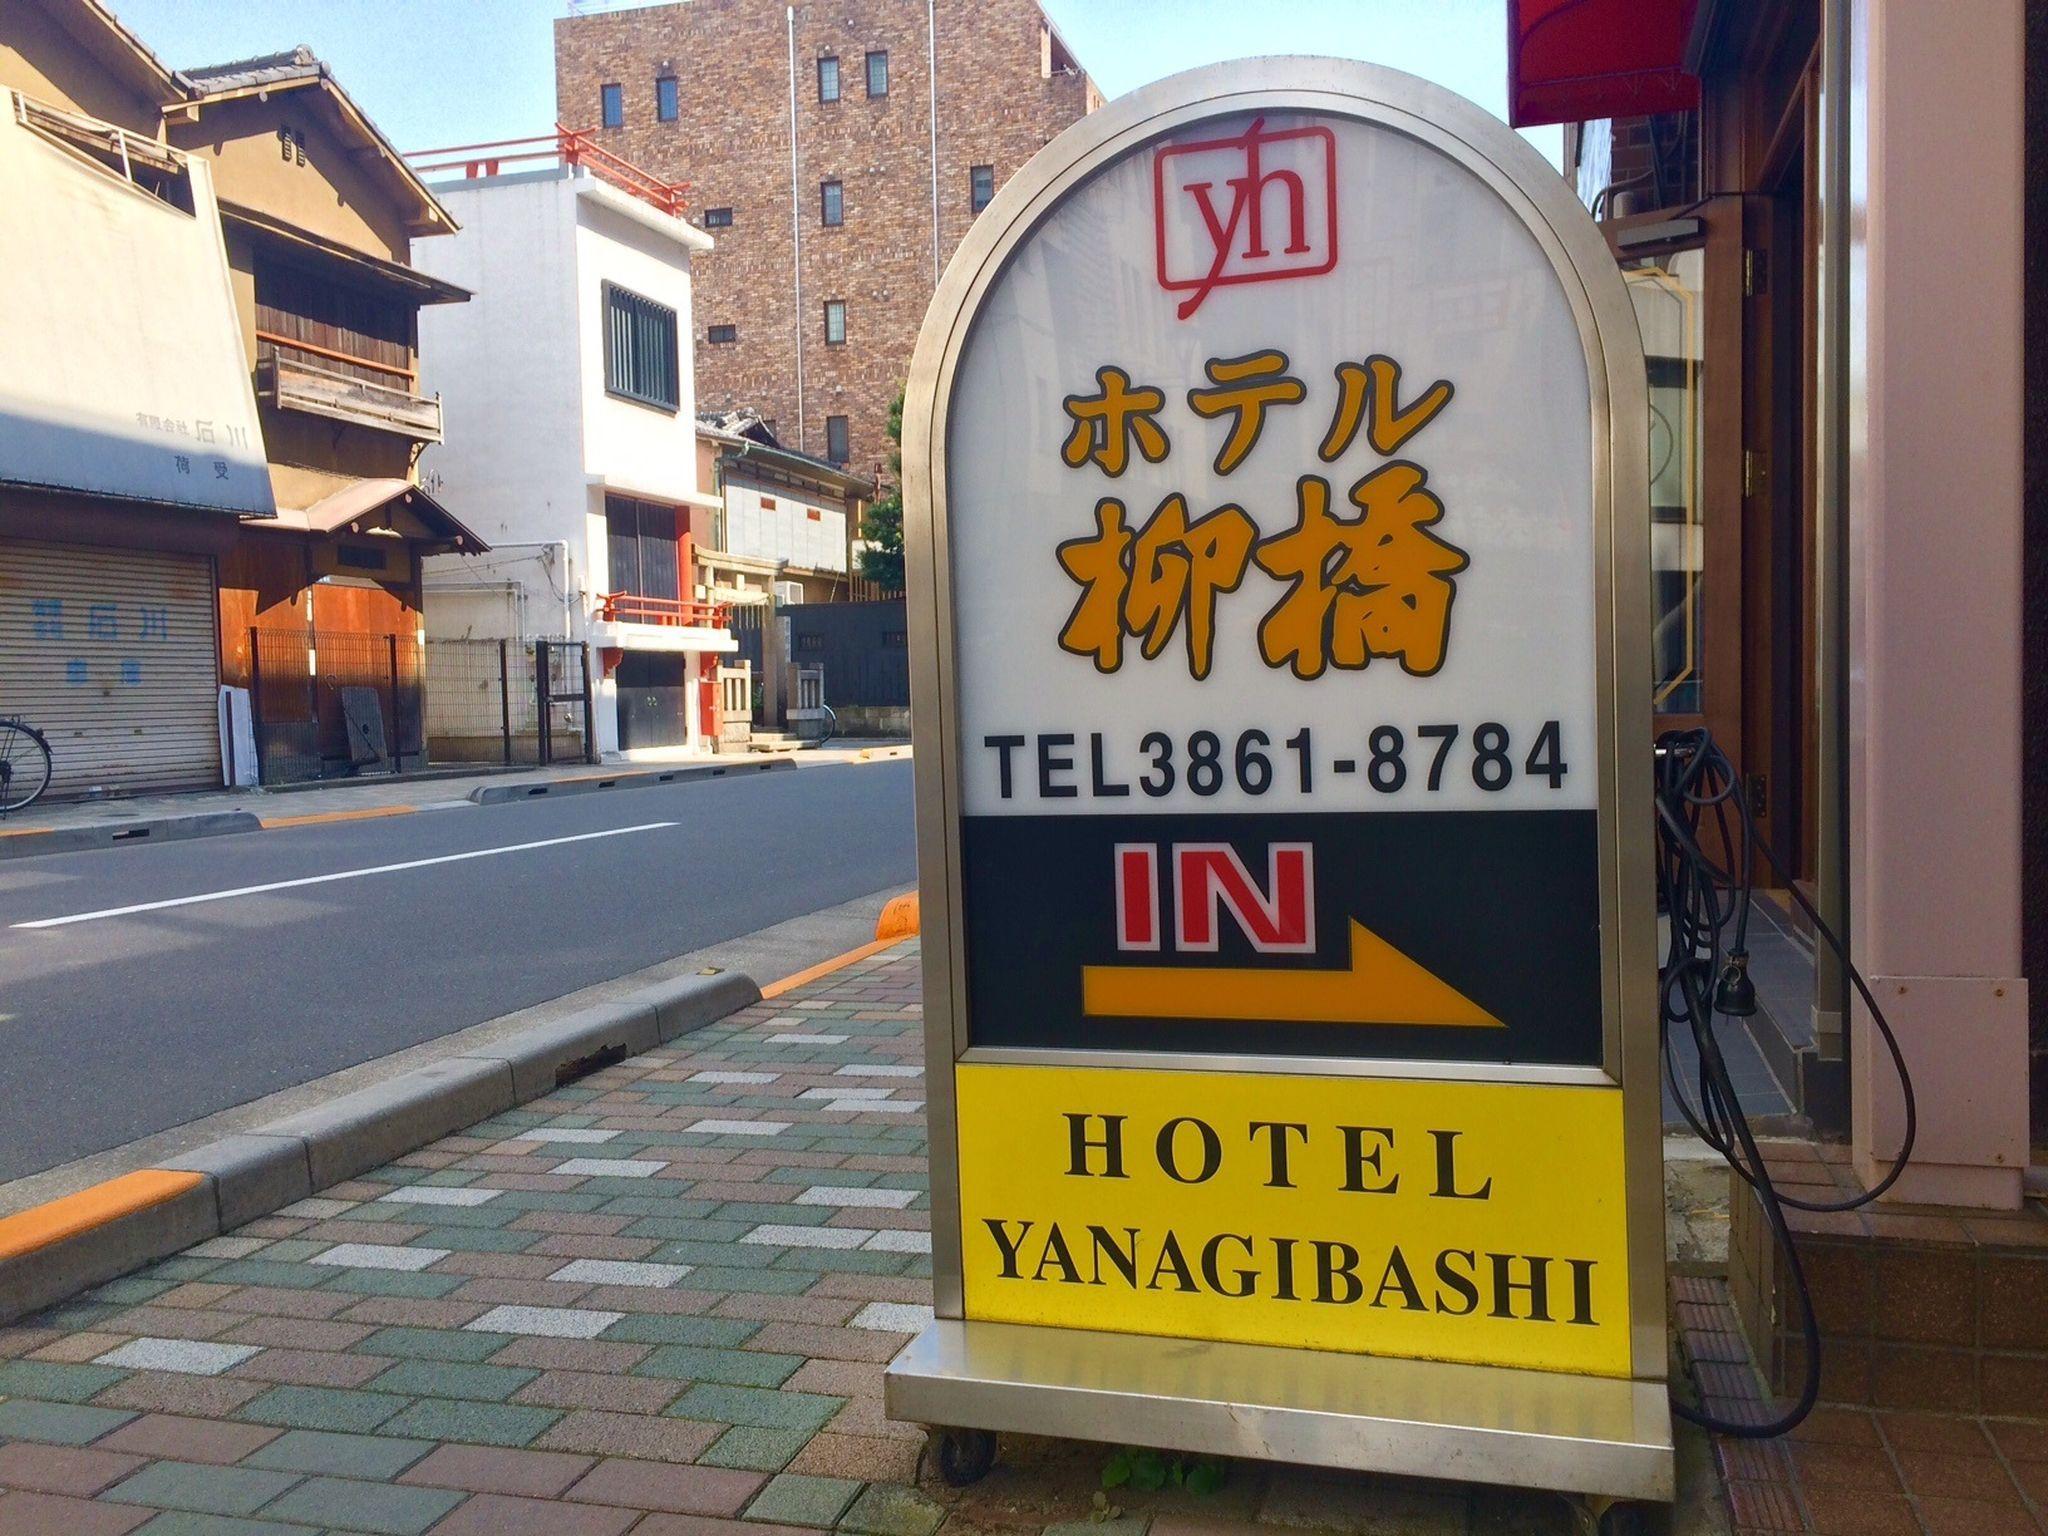 Hotel Yanagibasi, Chiyoda